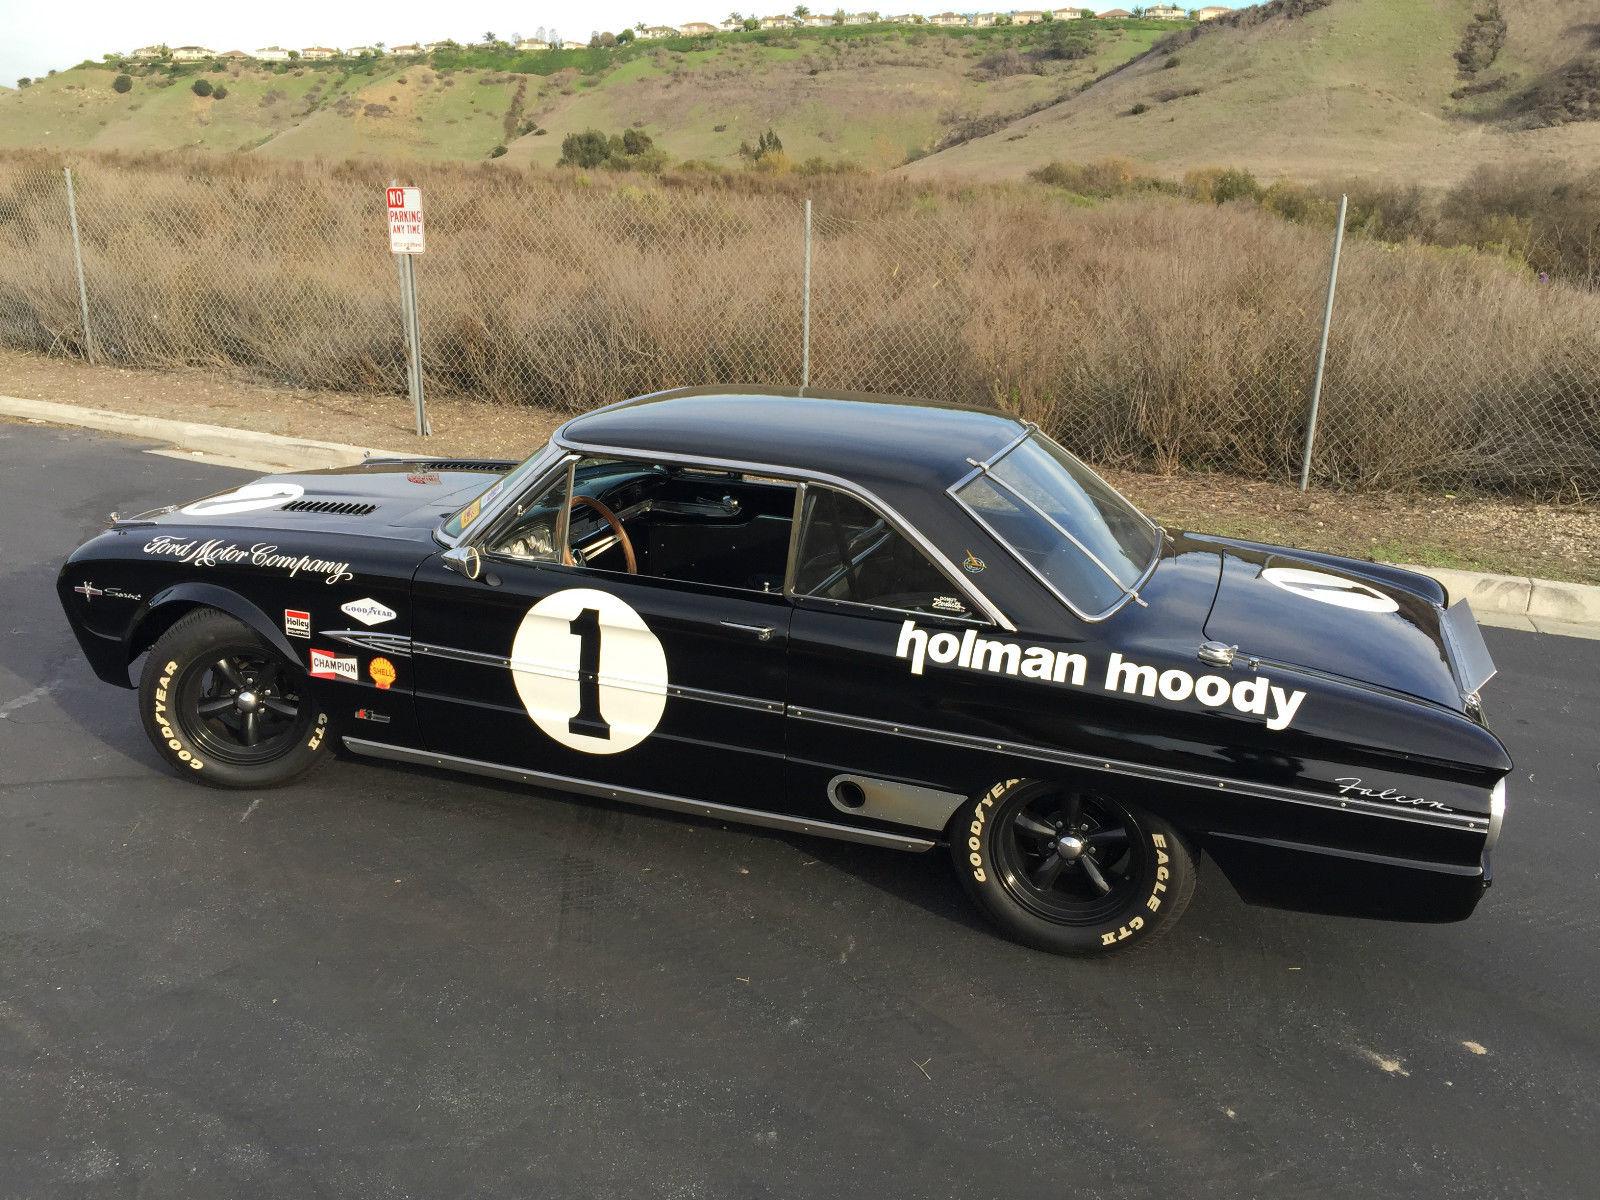 1963 1 2 Ford Falcon V8 Sprint Vintage Era Correct Trans